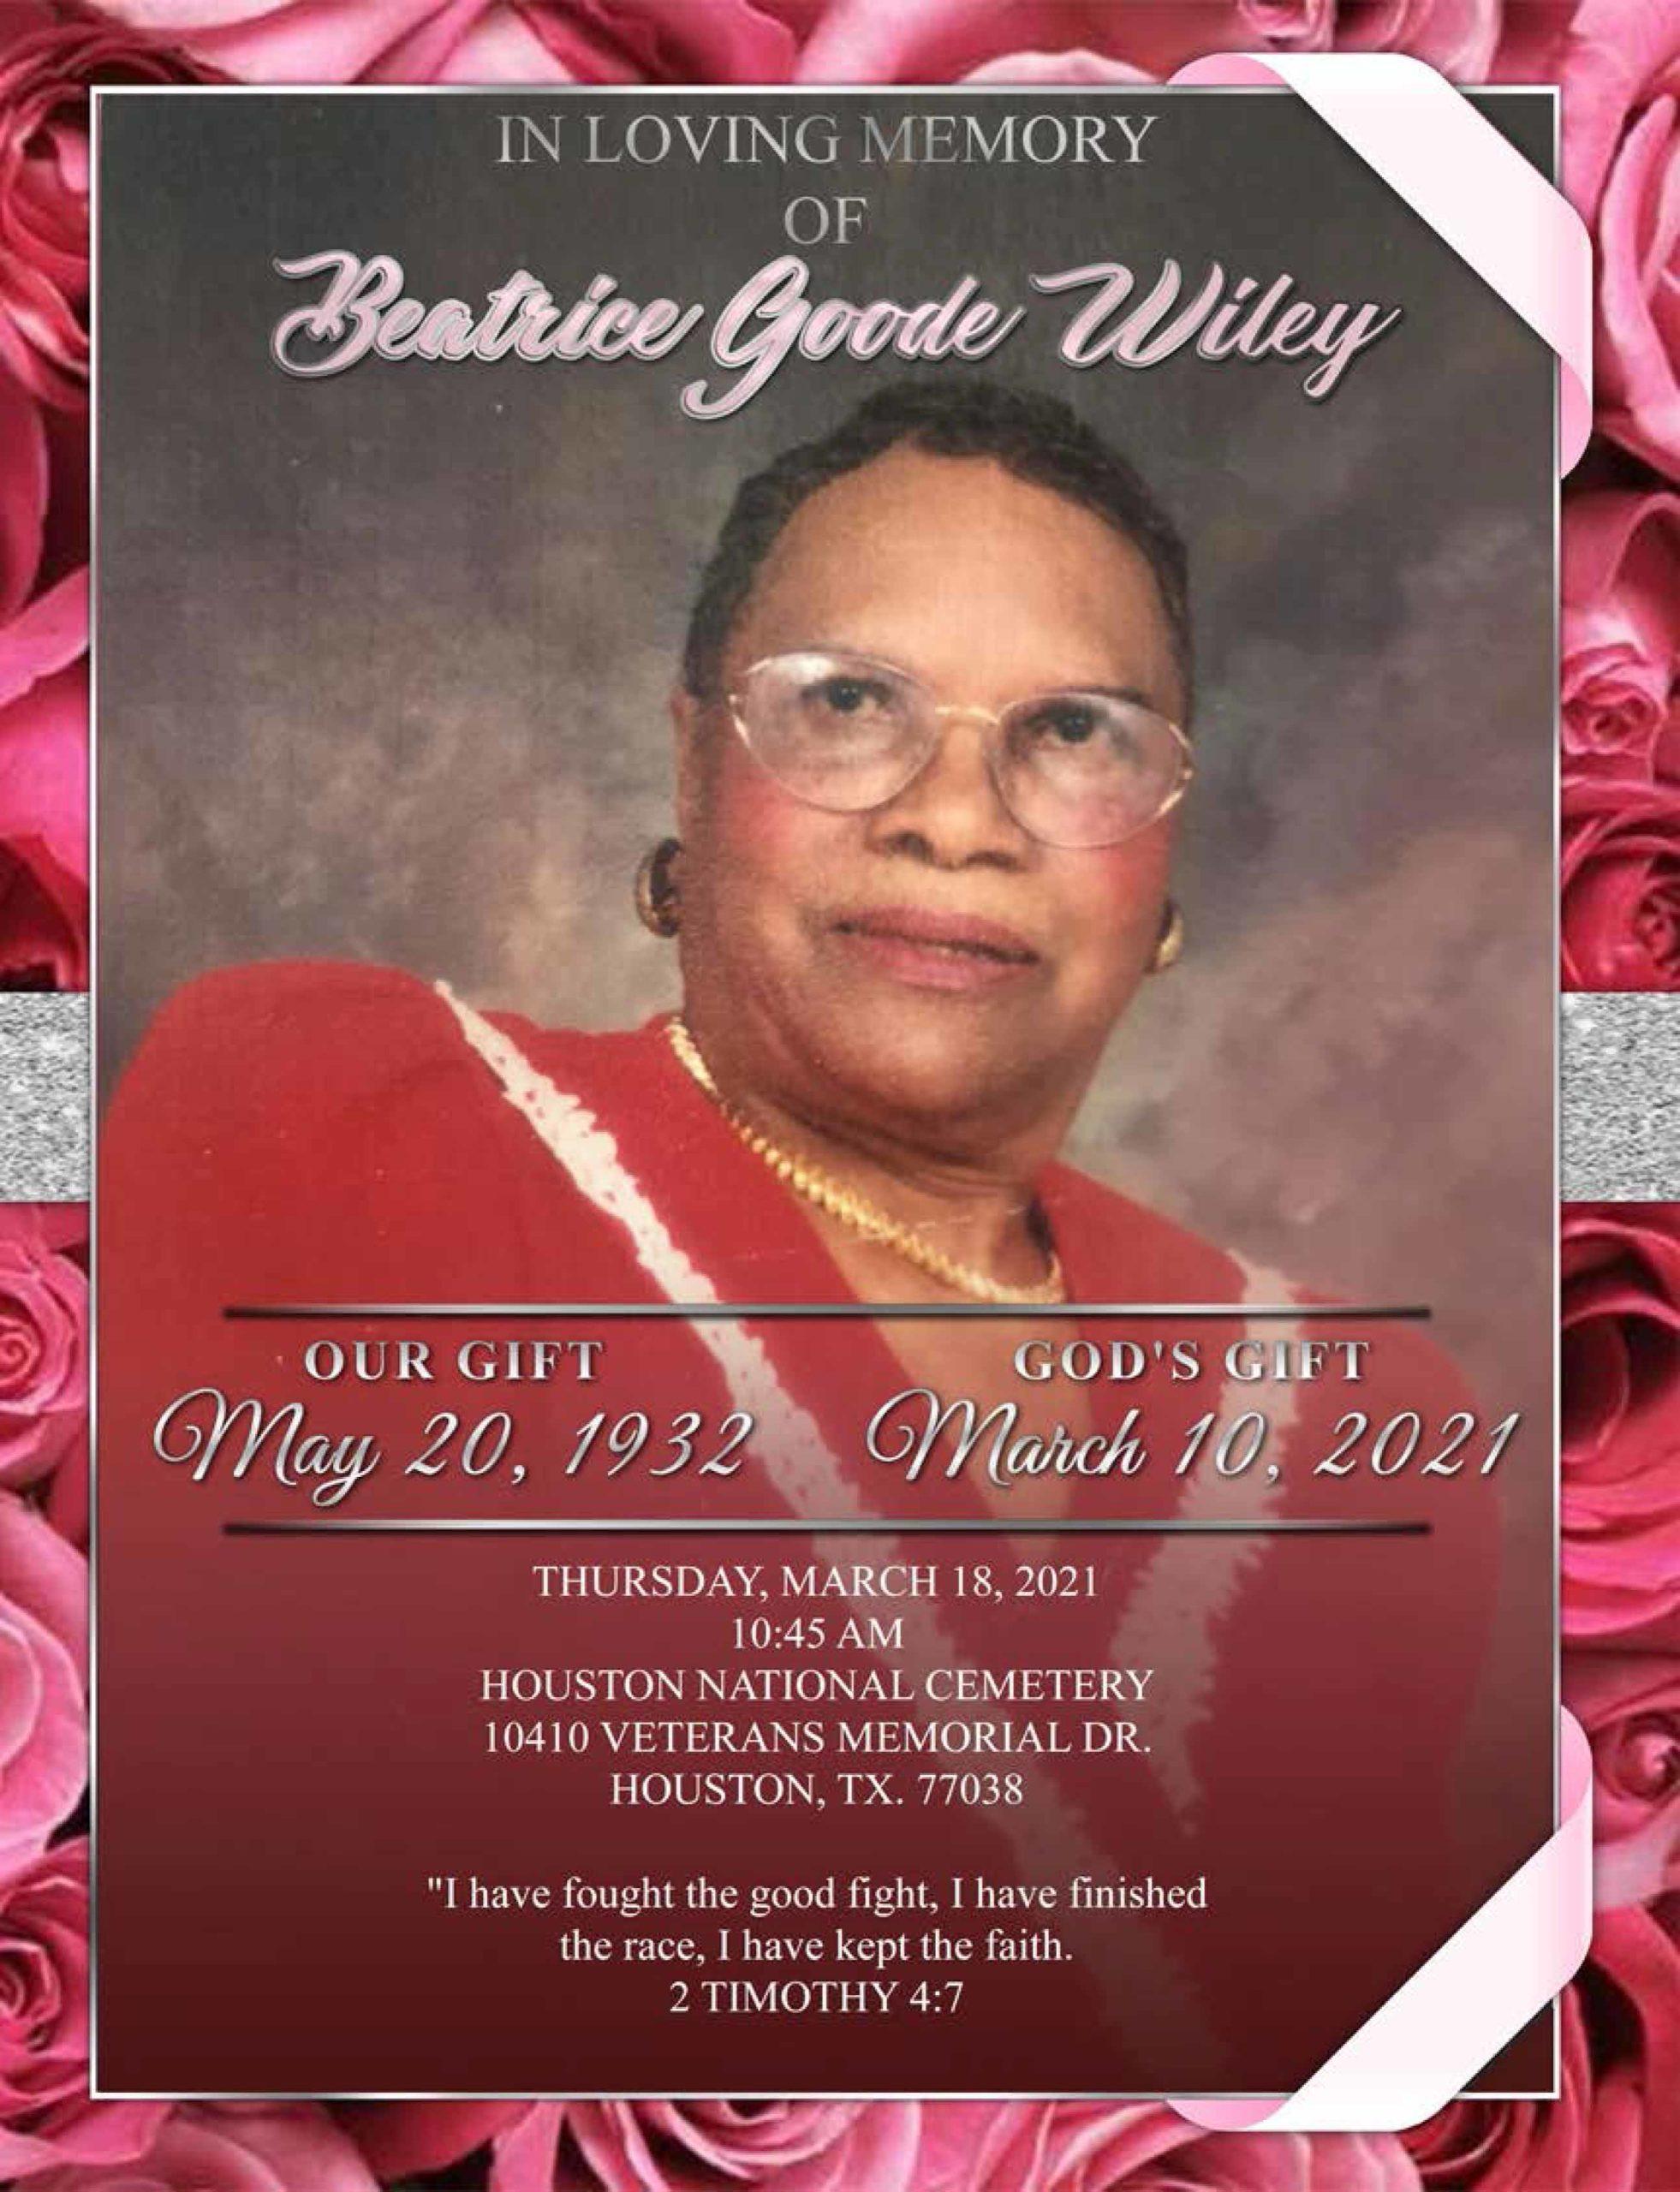 Beatrice Goode Wiley 1932-2021